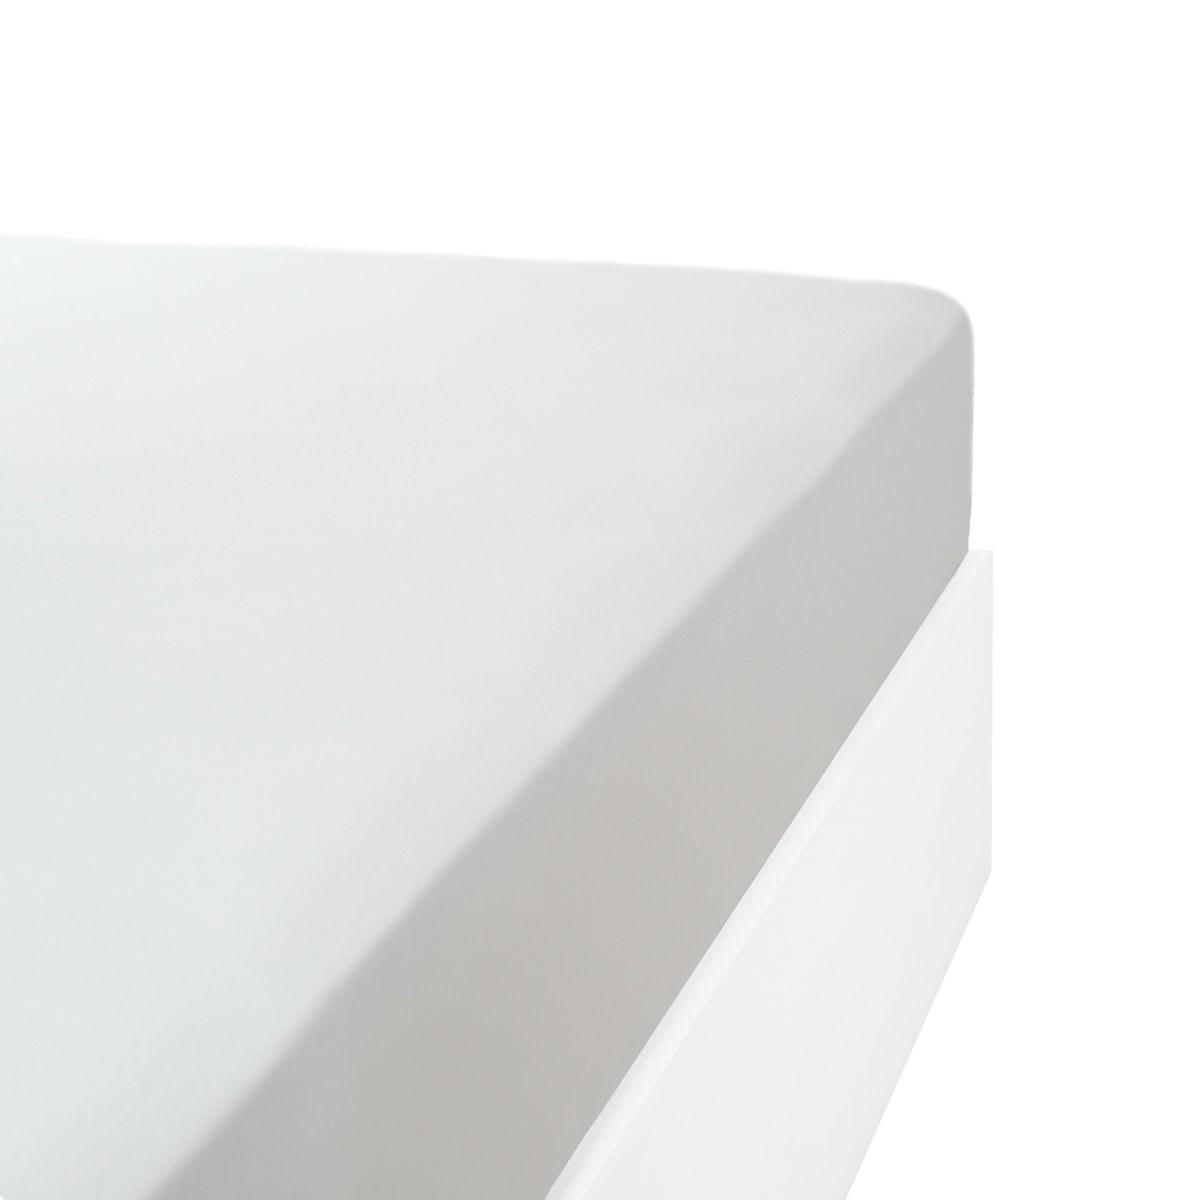 Drap housse jersey extensible en coton blanc 120x200 cm